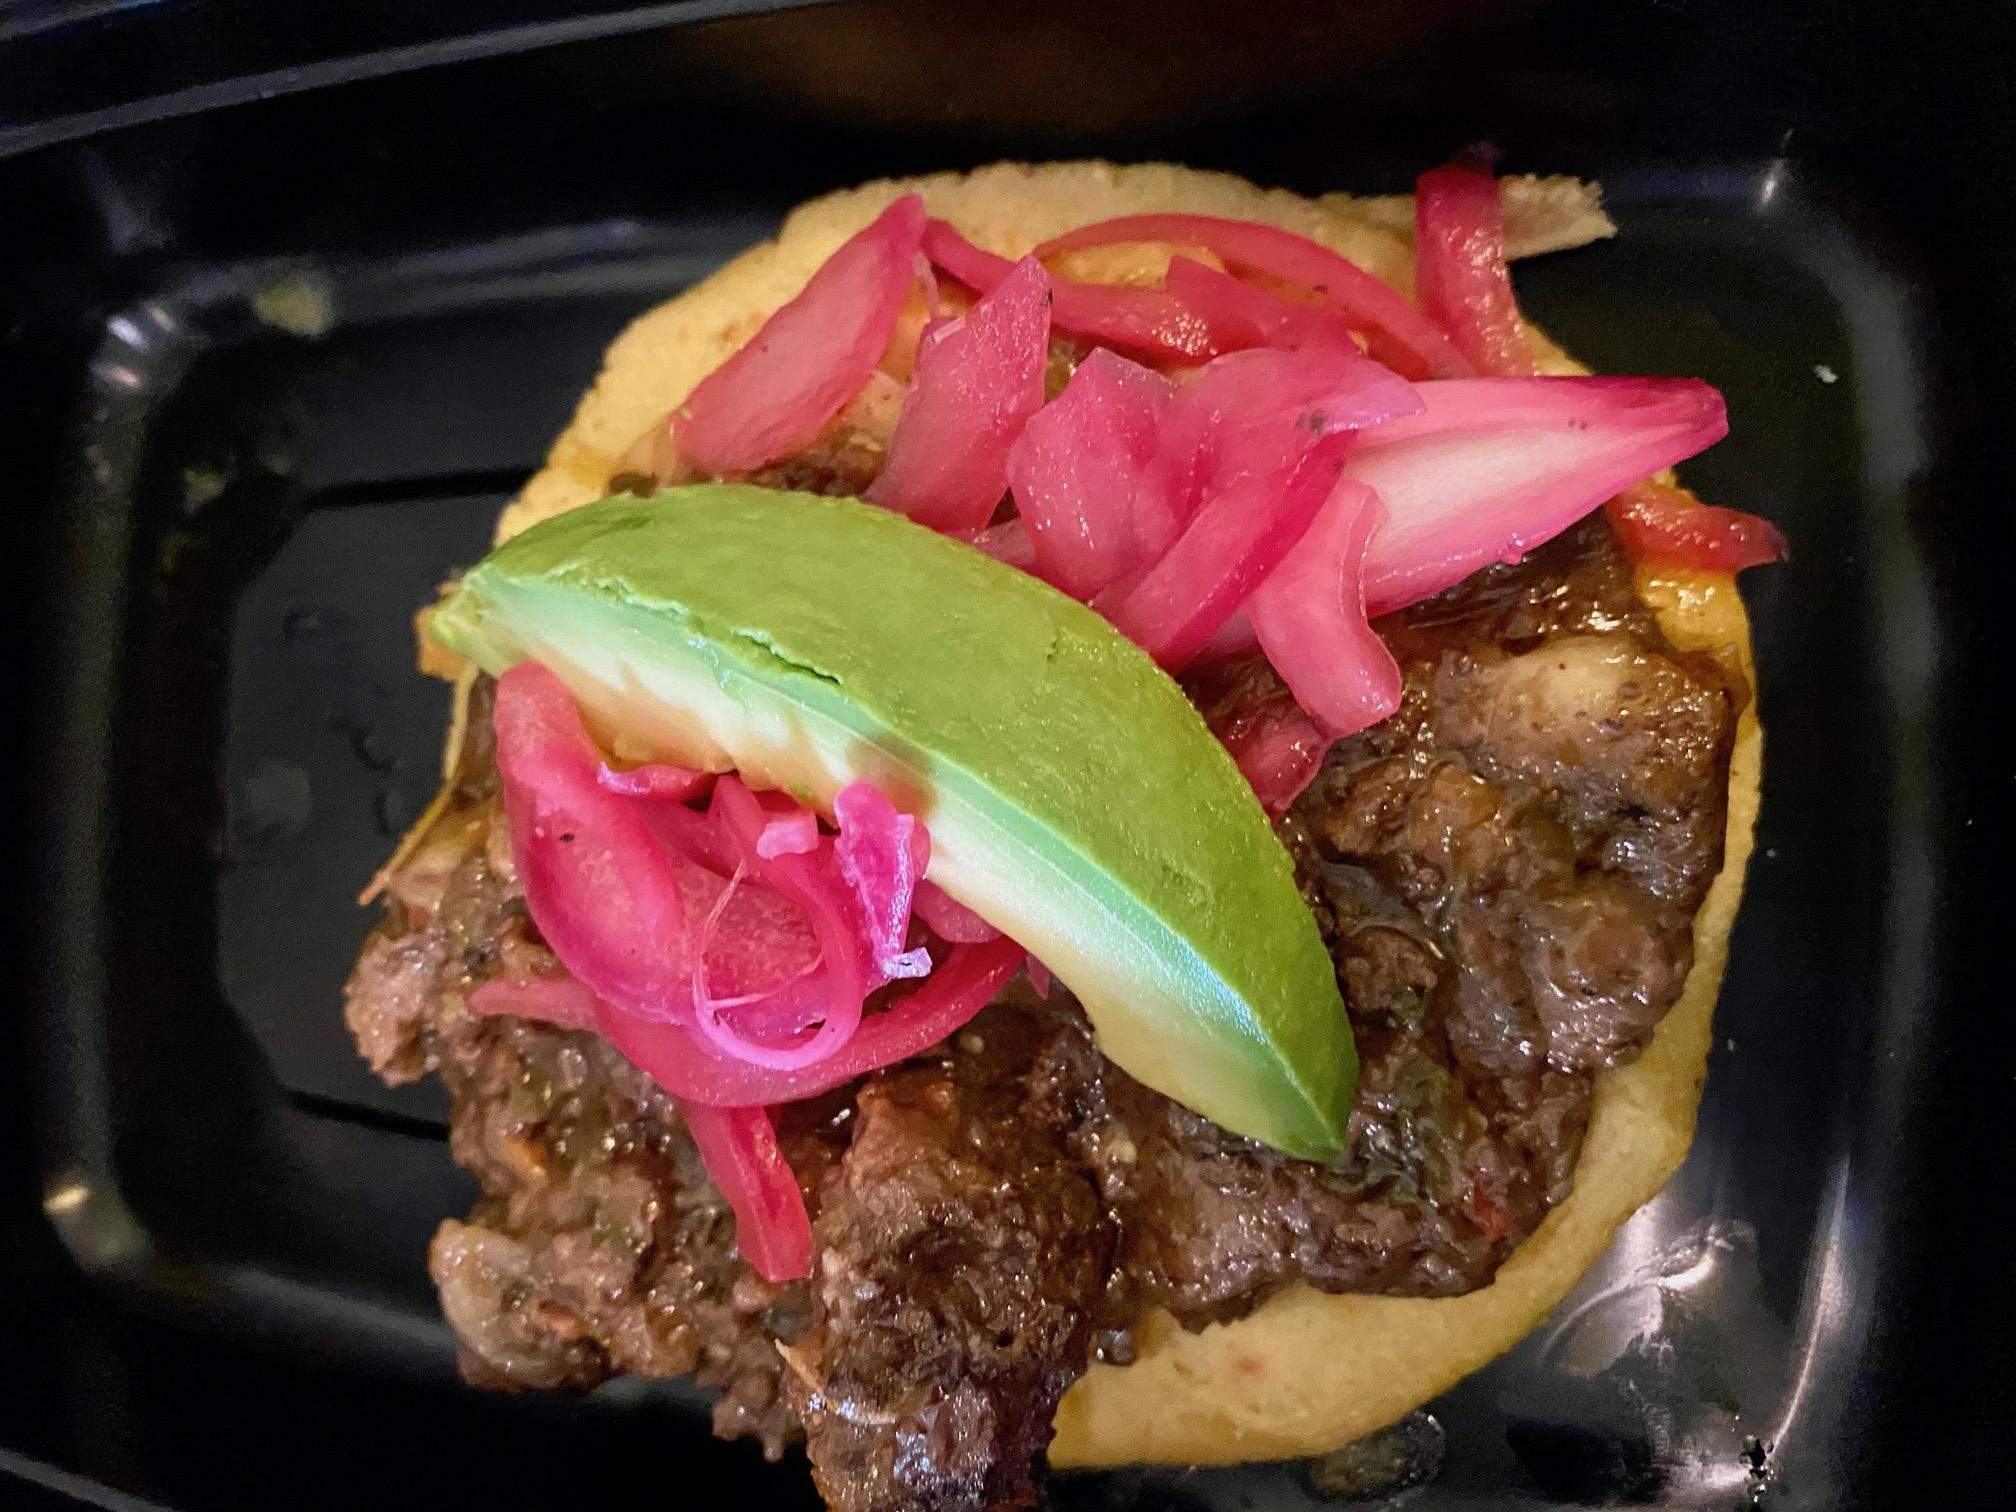 Moronga (blood sausage) taco at Los Guisados Del Patrón